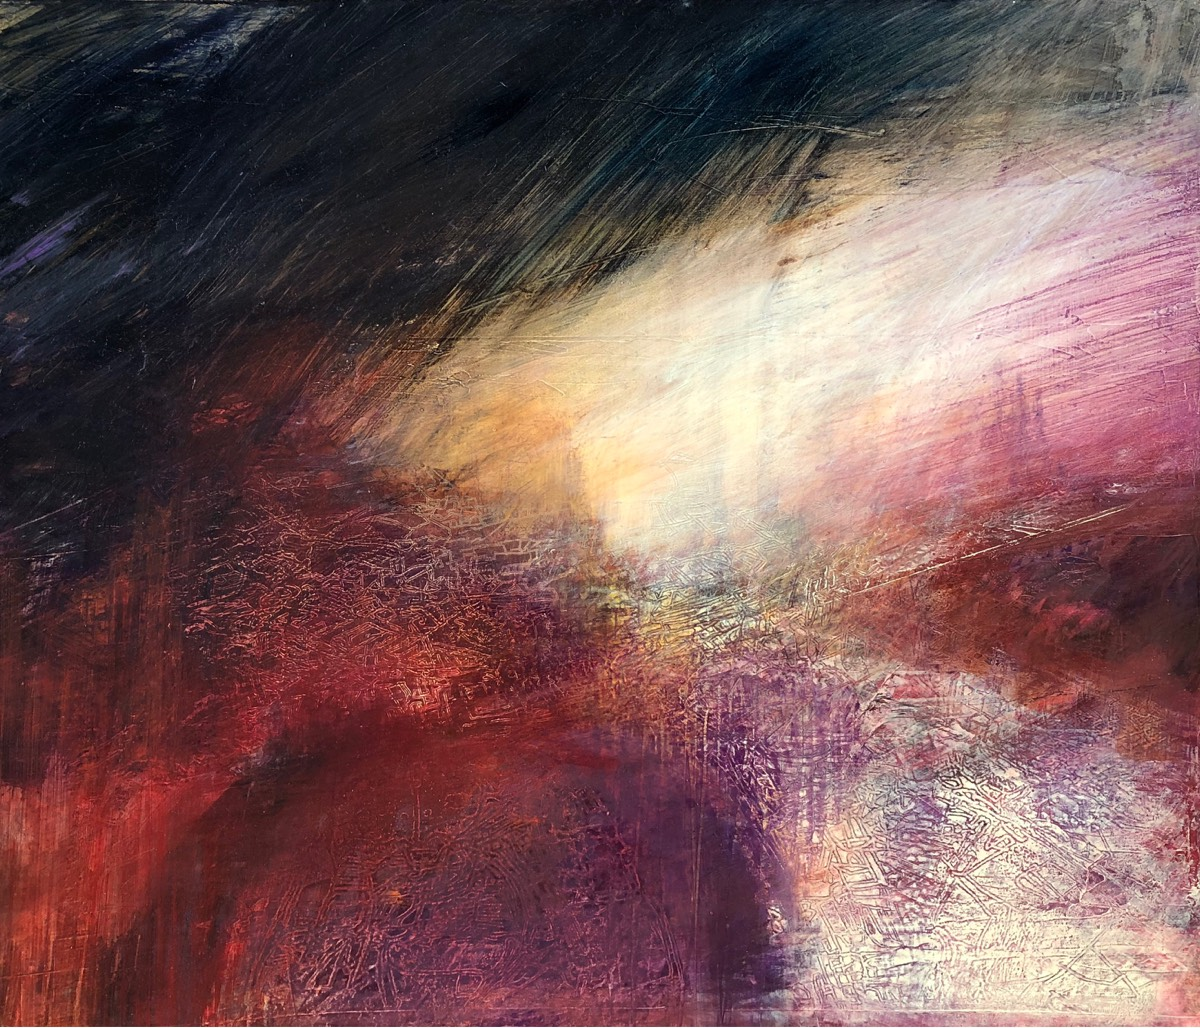 Tempest 2019 , oil on panel, 52 x 61.5cm